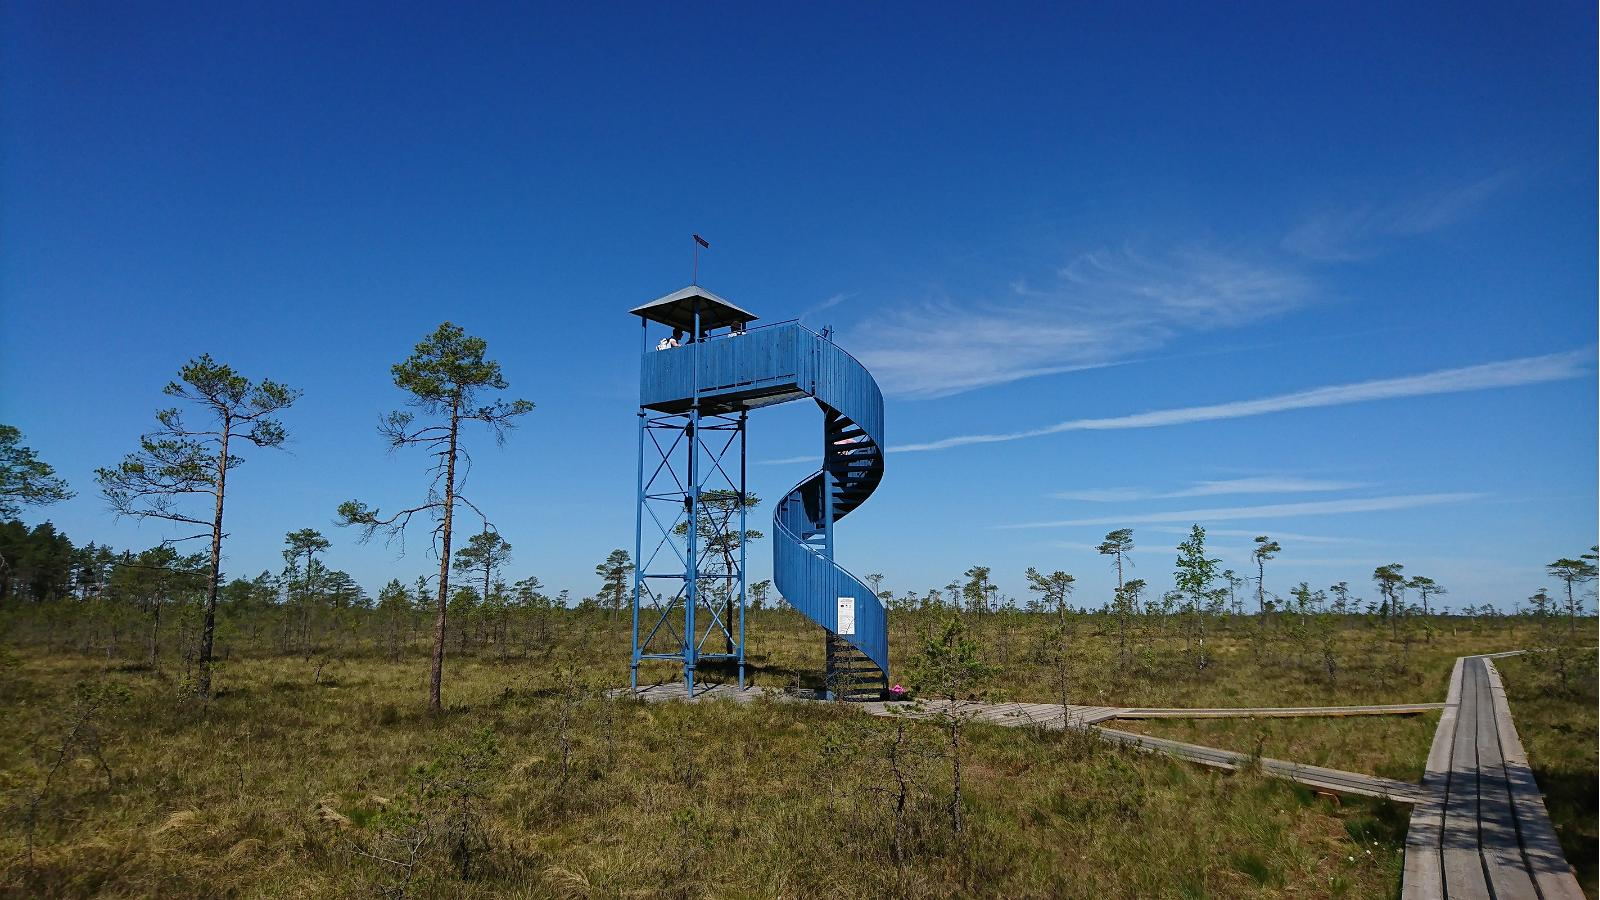 hiking in estonia, soomaa trails